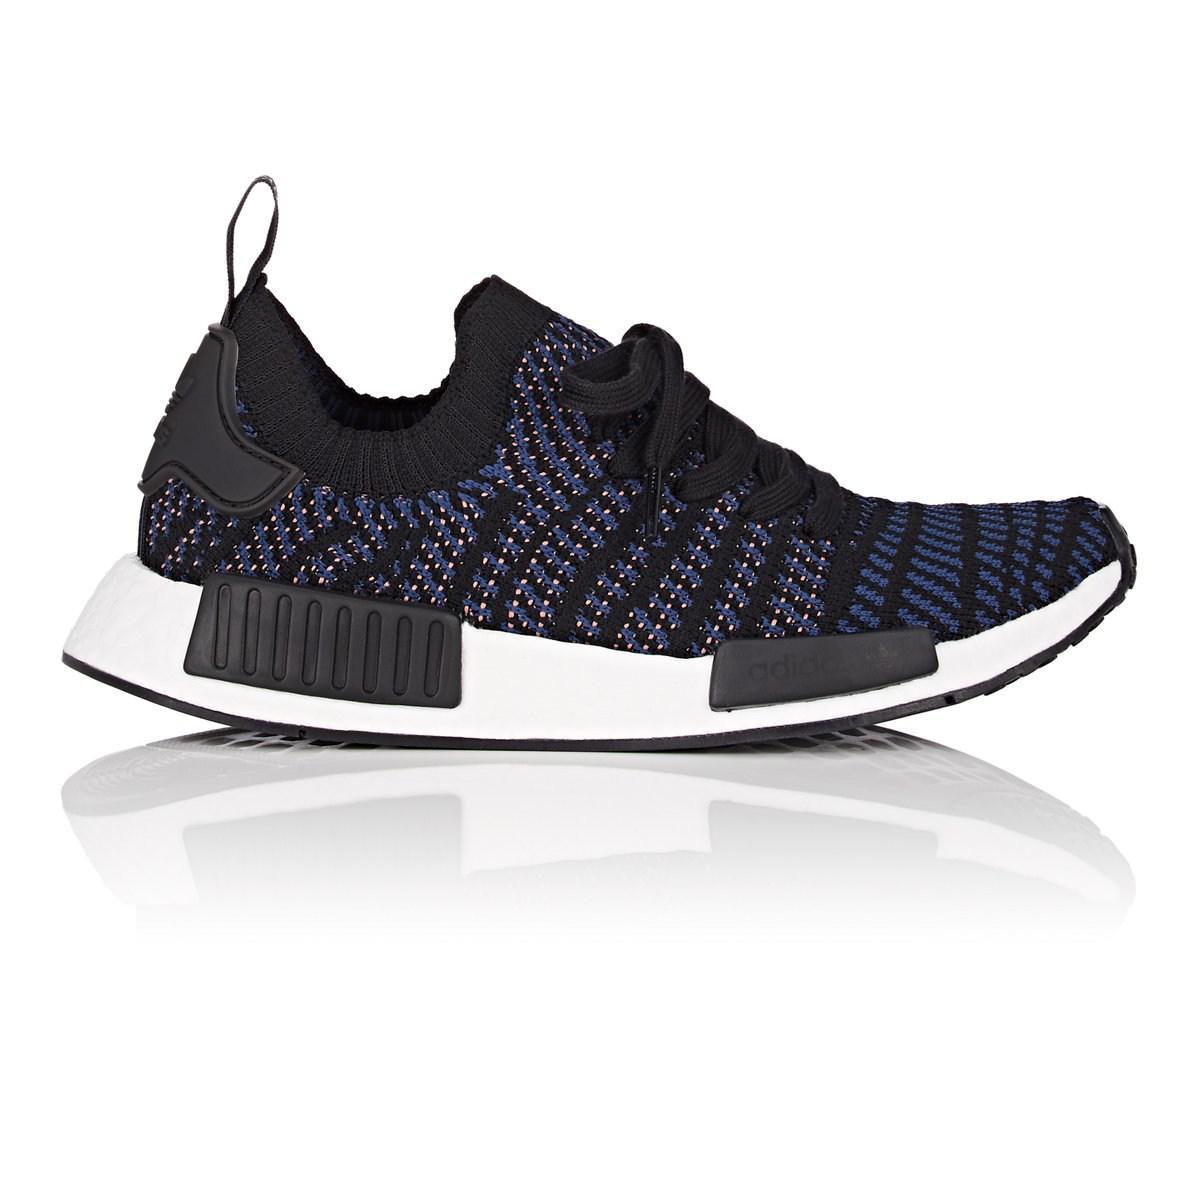 hot sale online aa6e8 2e003 adidas. Women s Black Nmd R1 Stlt Primeknit Sneakers